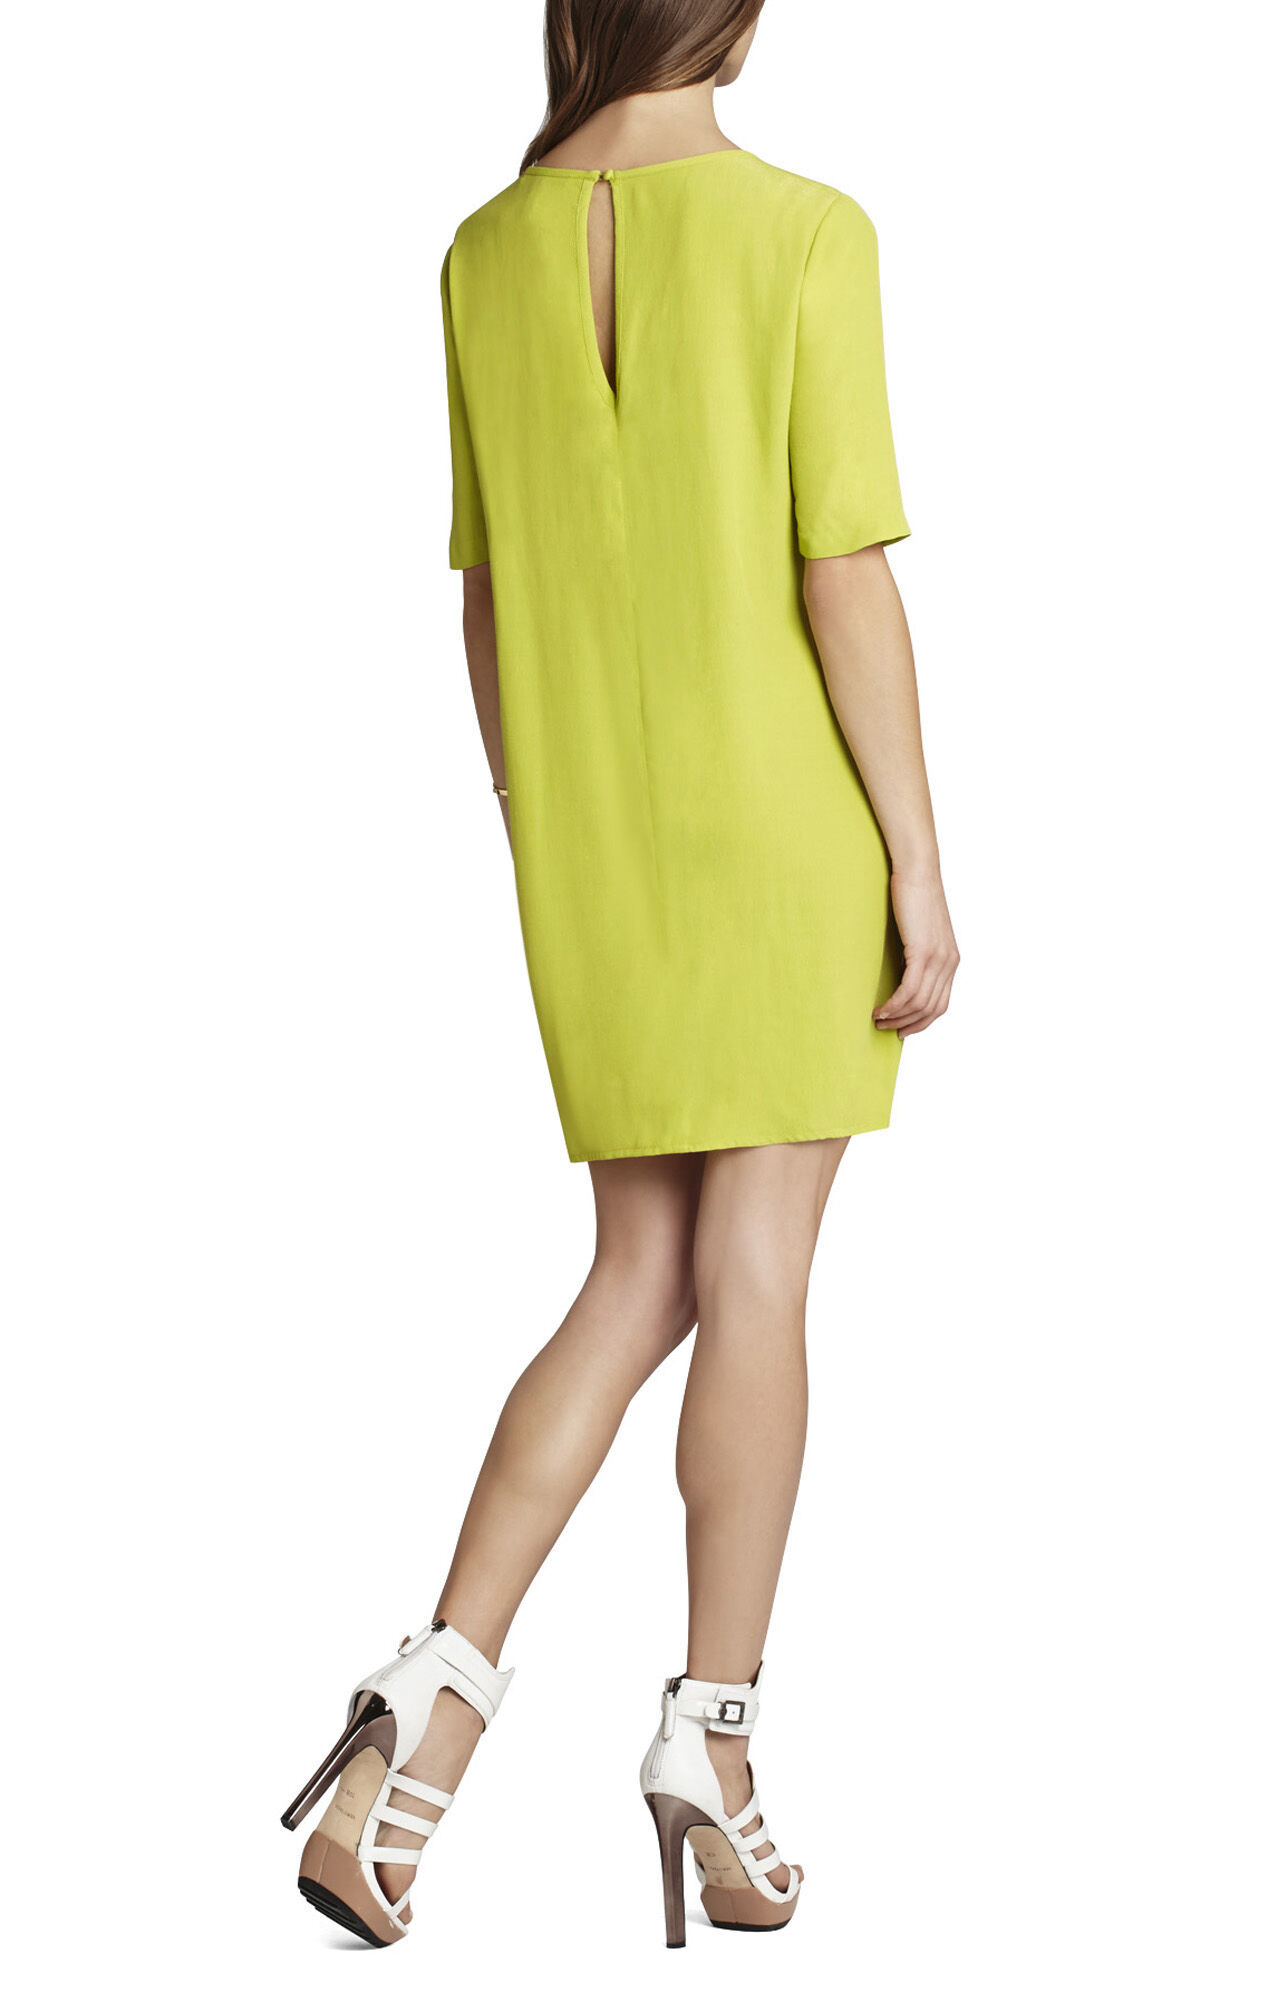 Rosetta Dress With Cutouts